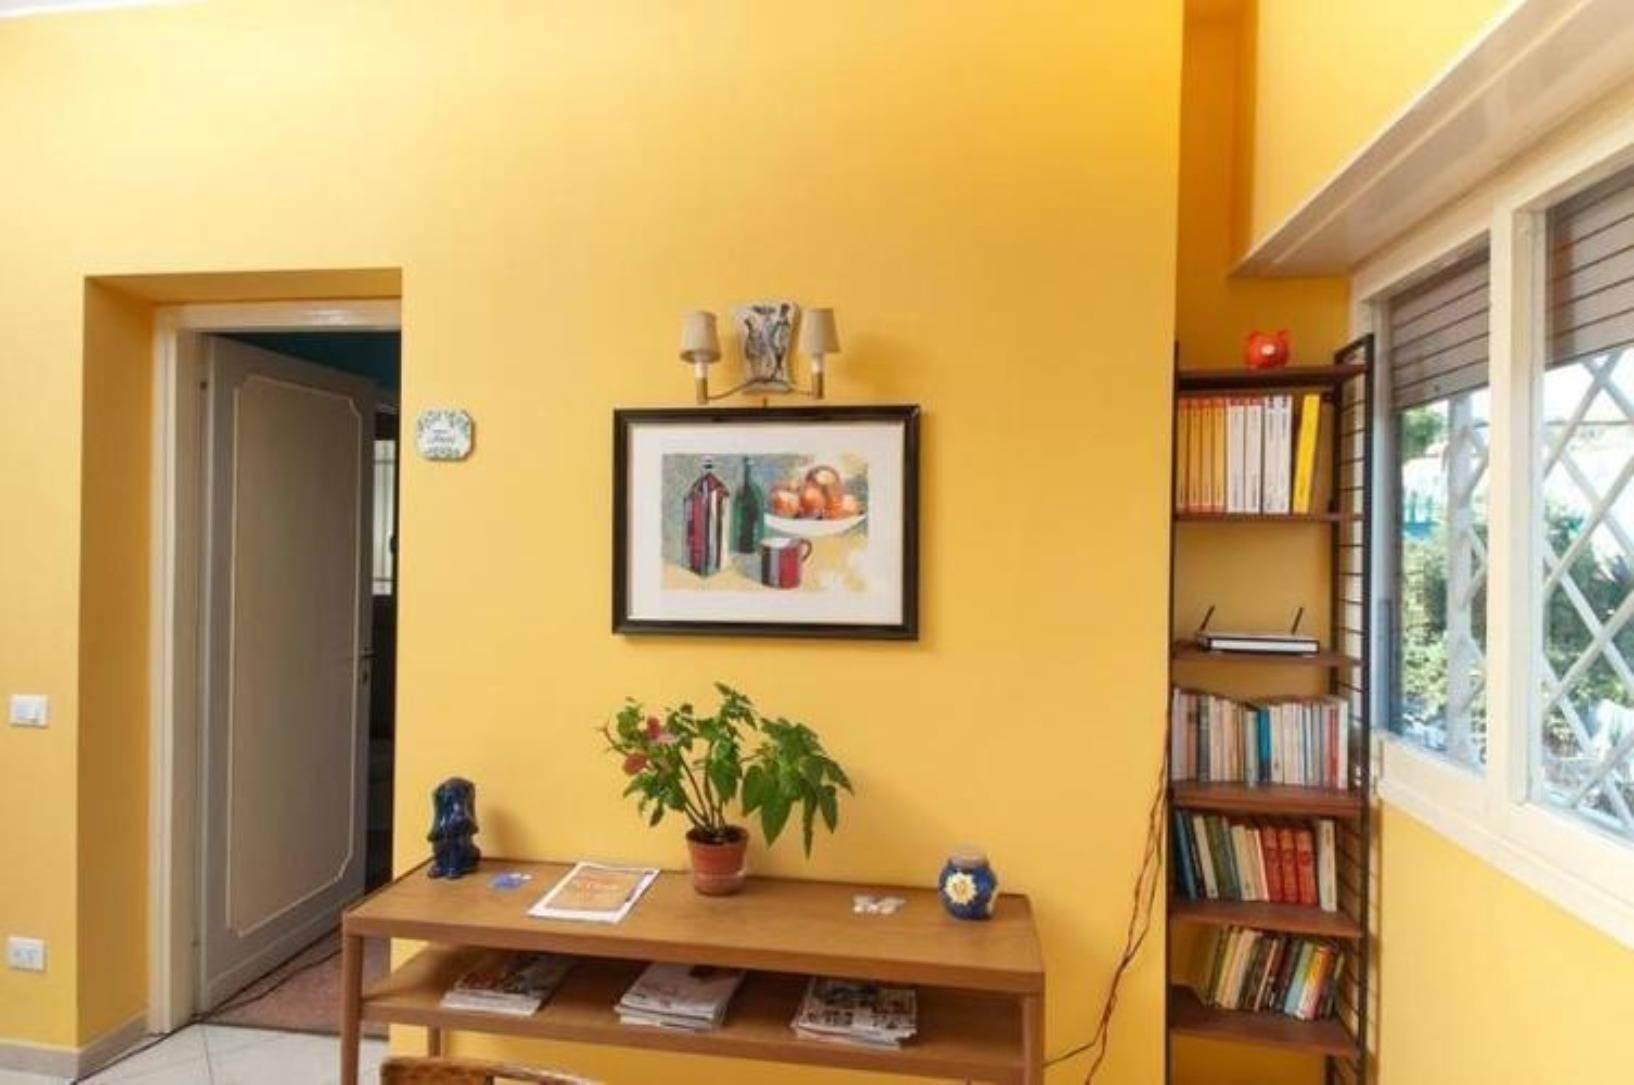 A living room at Passegiate Romane B&B.